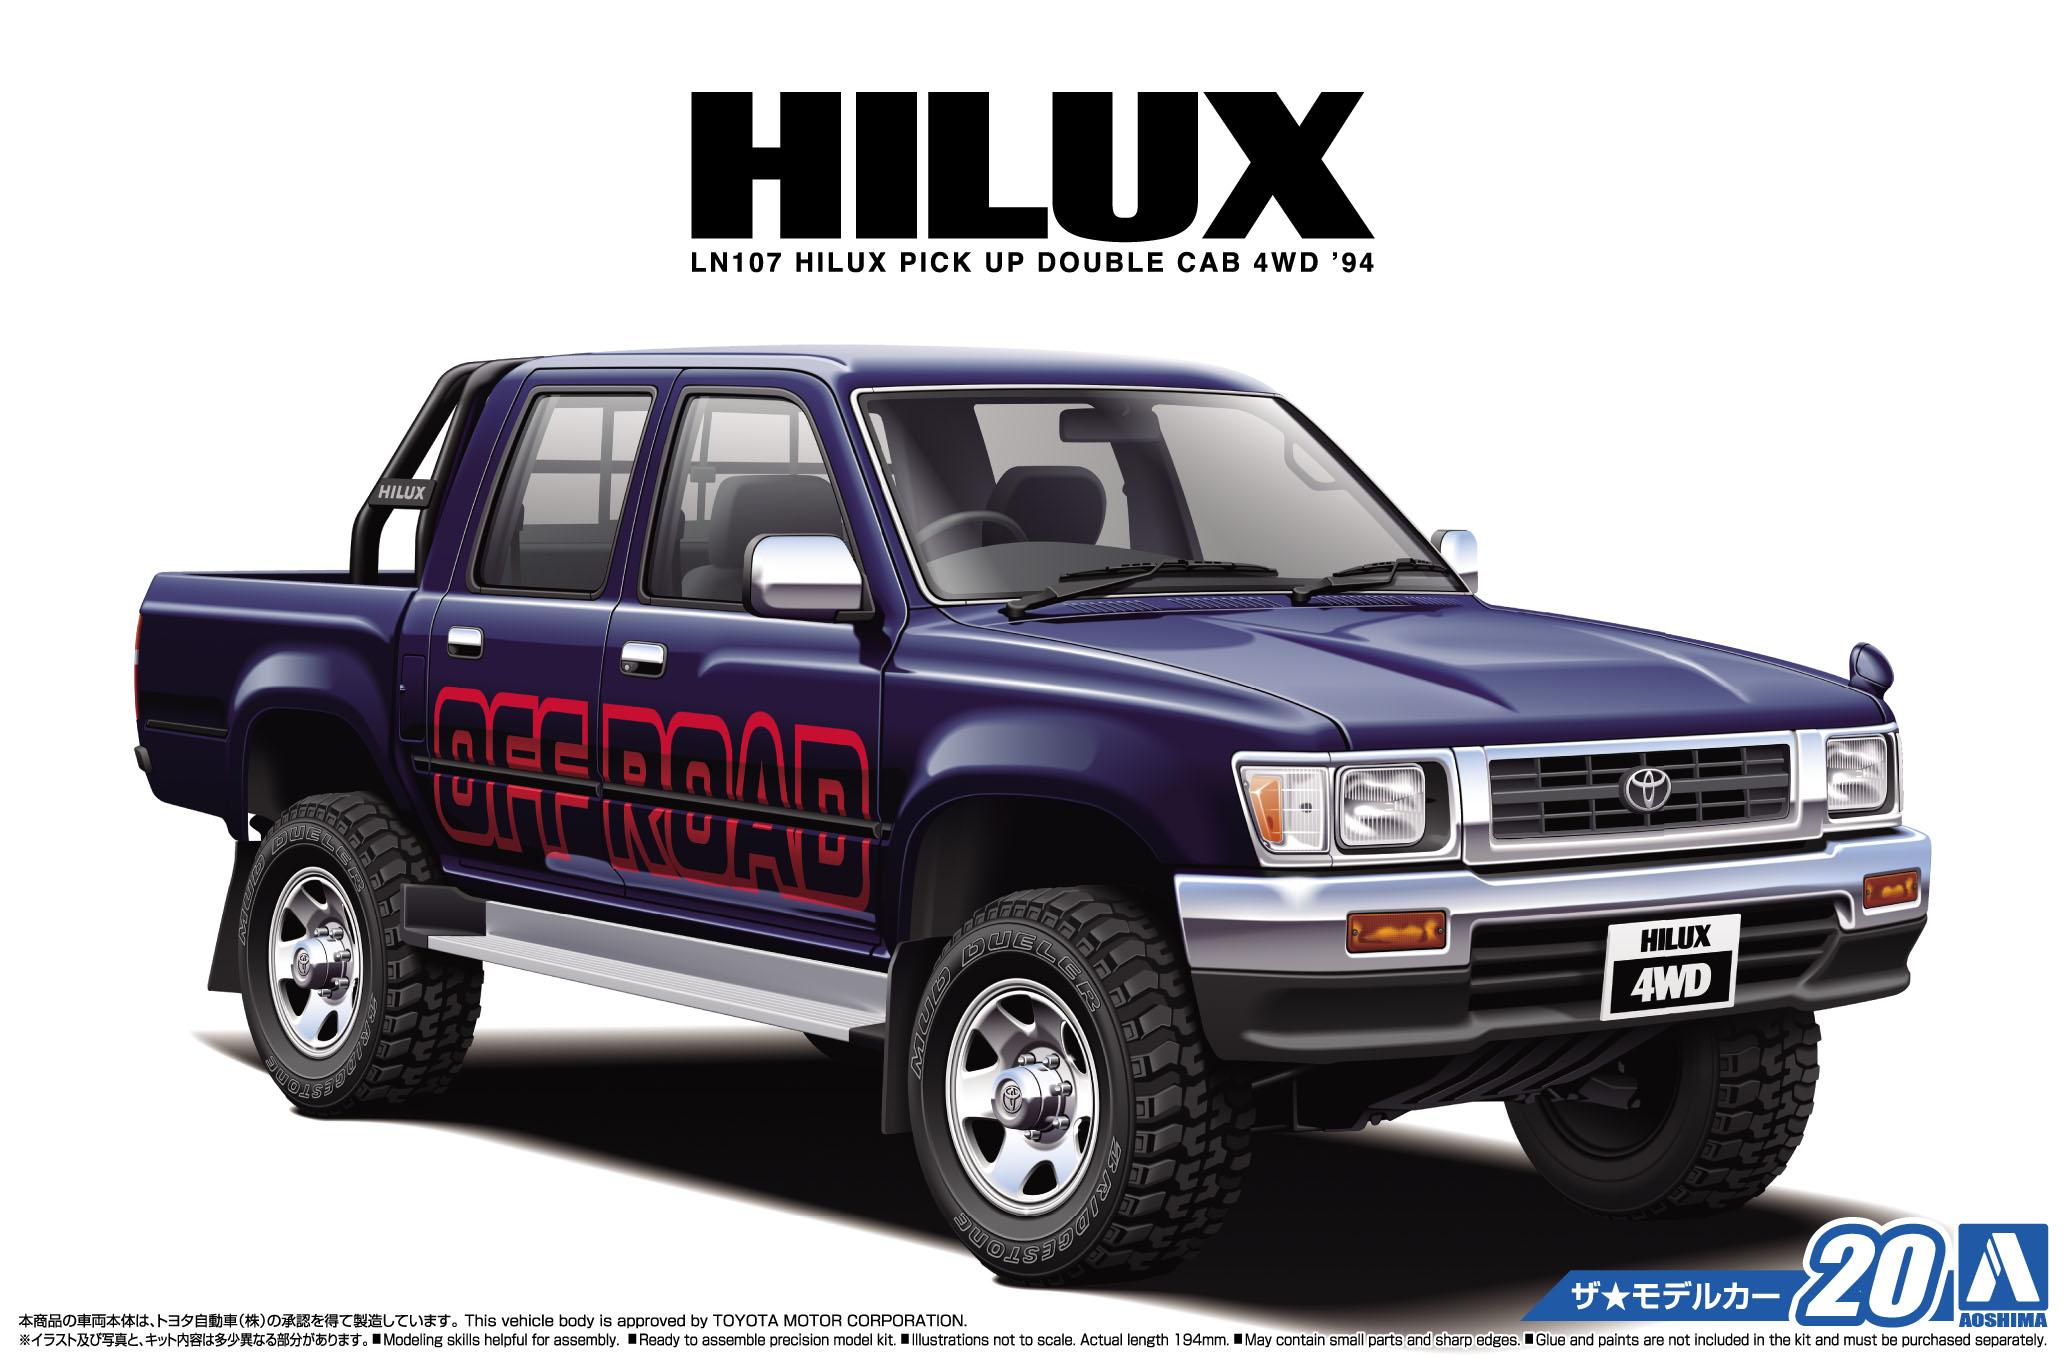 Aoshima 1/24 TOYOTA LN107 HILUX PICK UP DOUBLE CAB 4WD '94